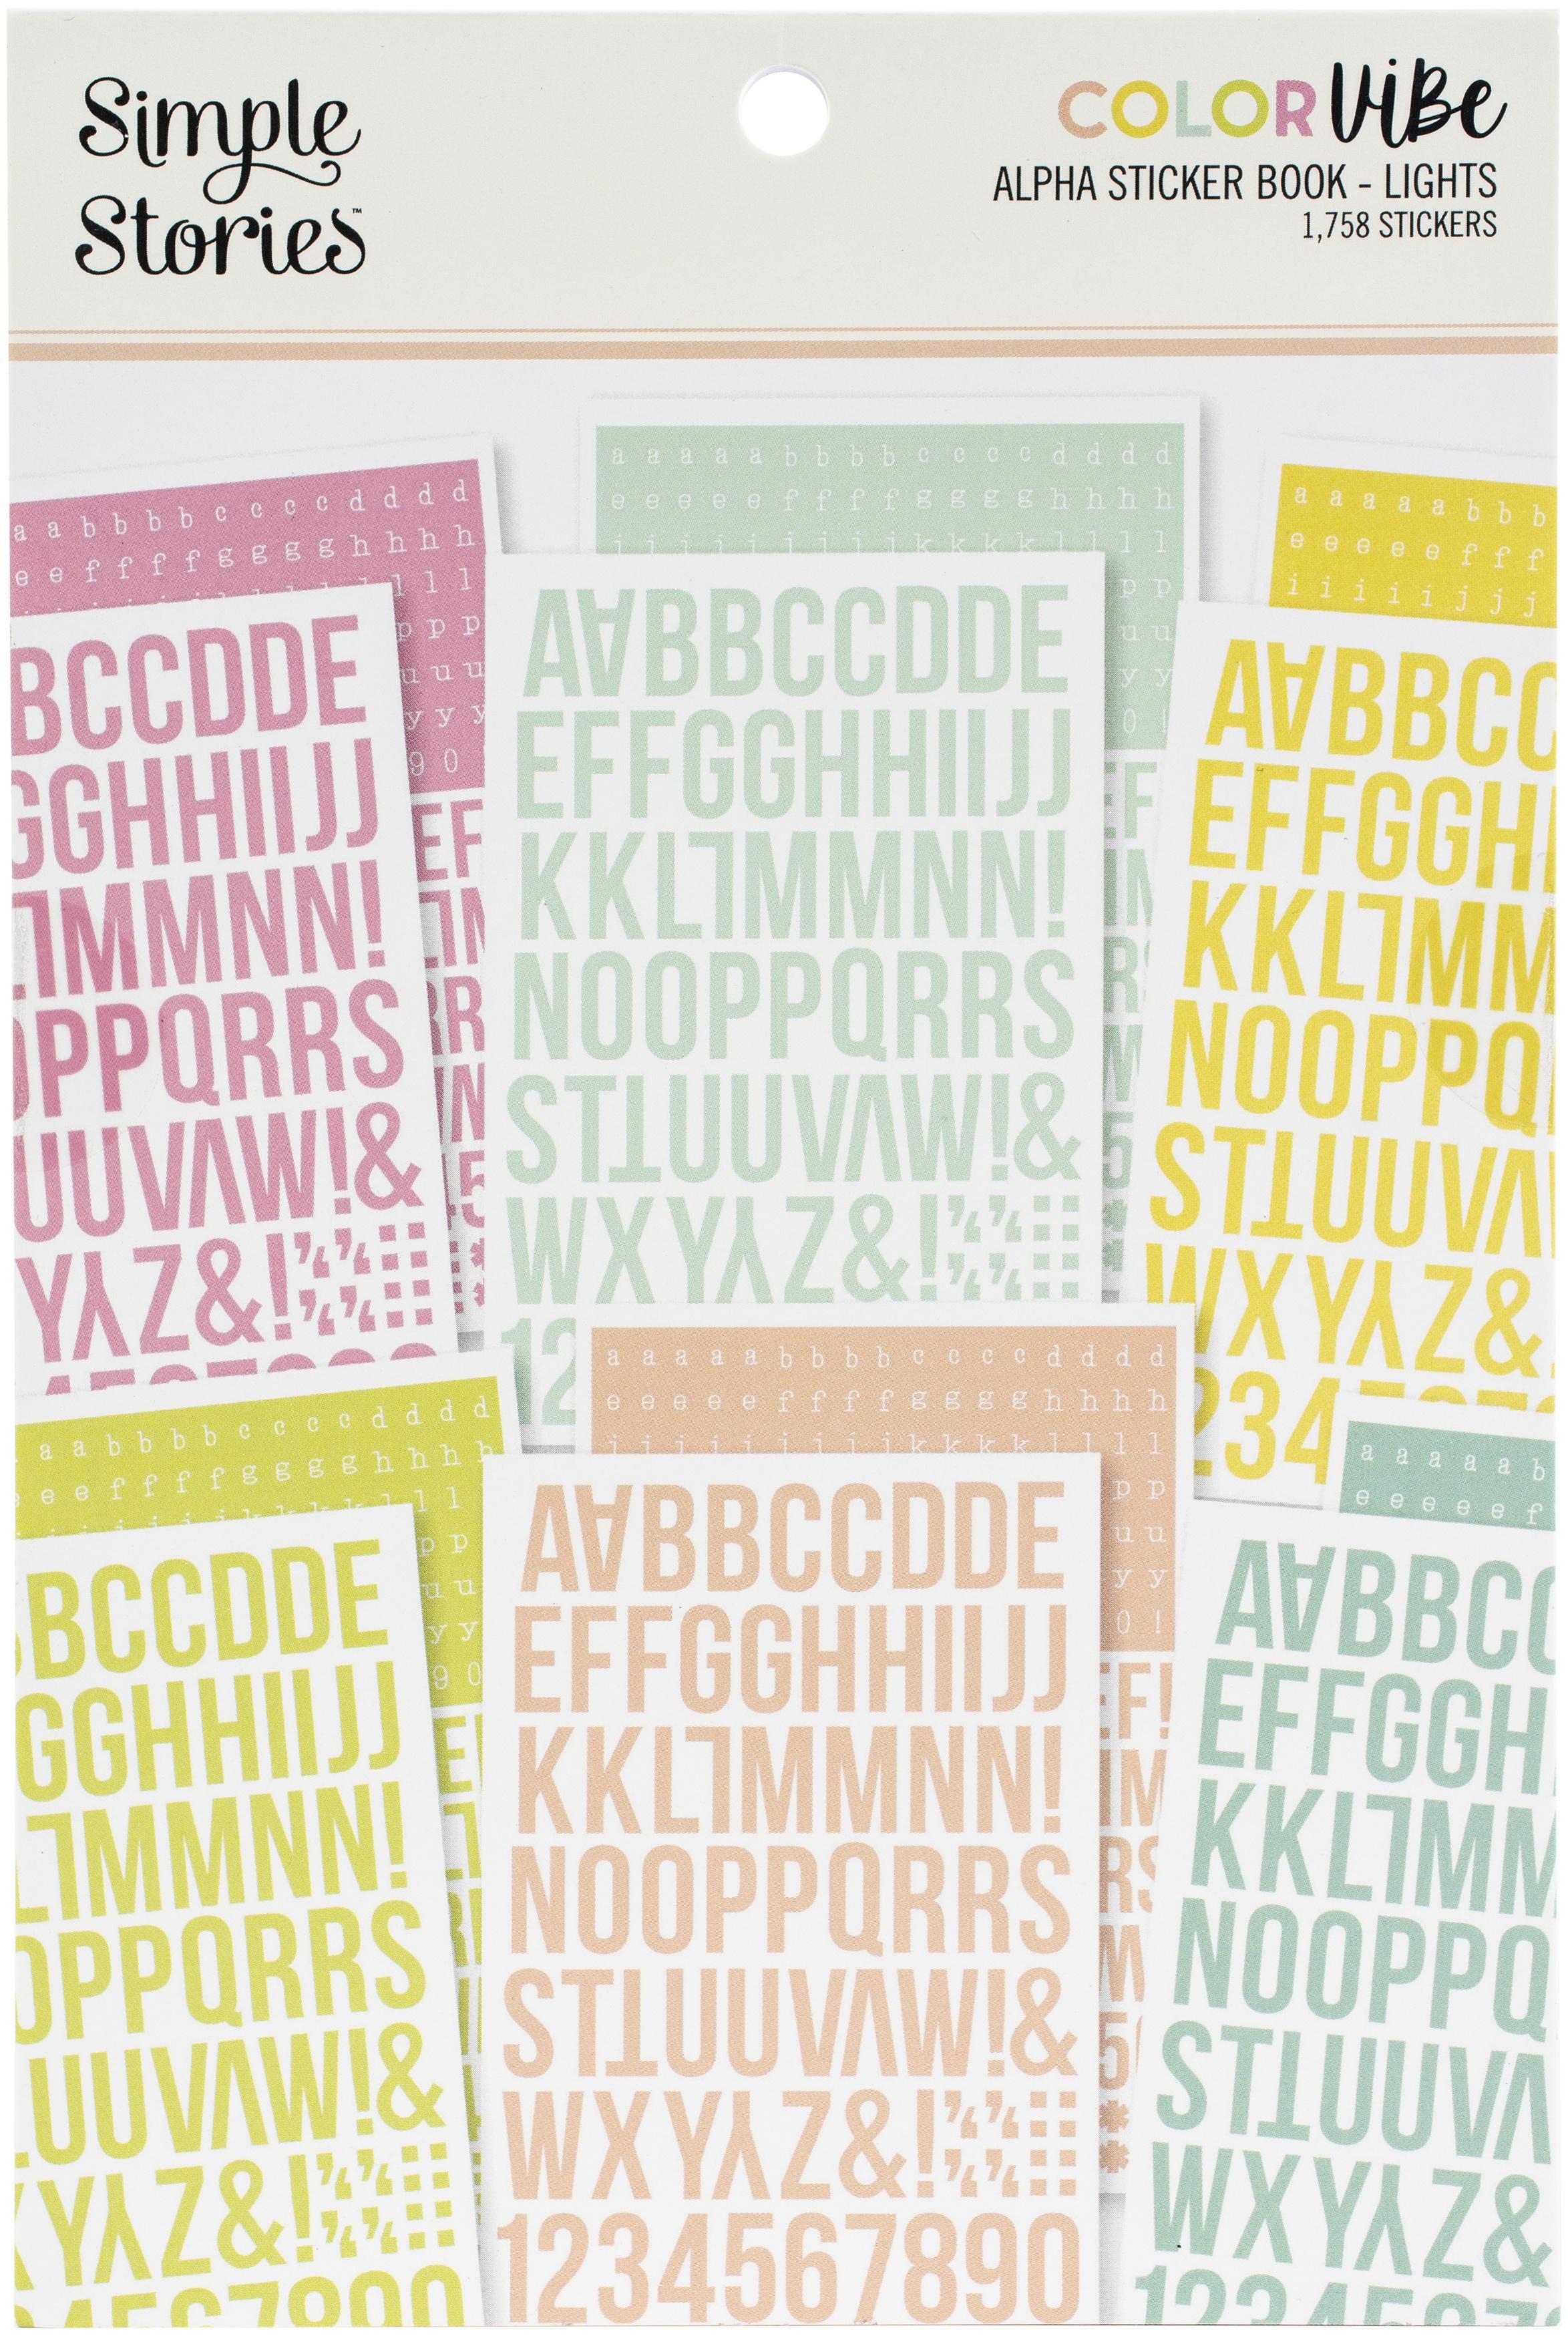 Simple Stories Color Vibe Alpha Sticker Book 12/Sheets-Lights, 1758/Pkg